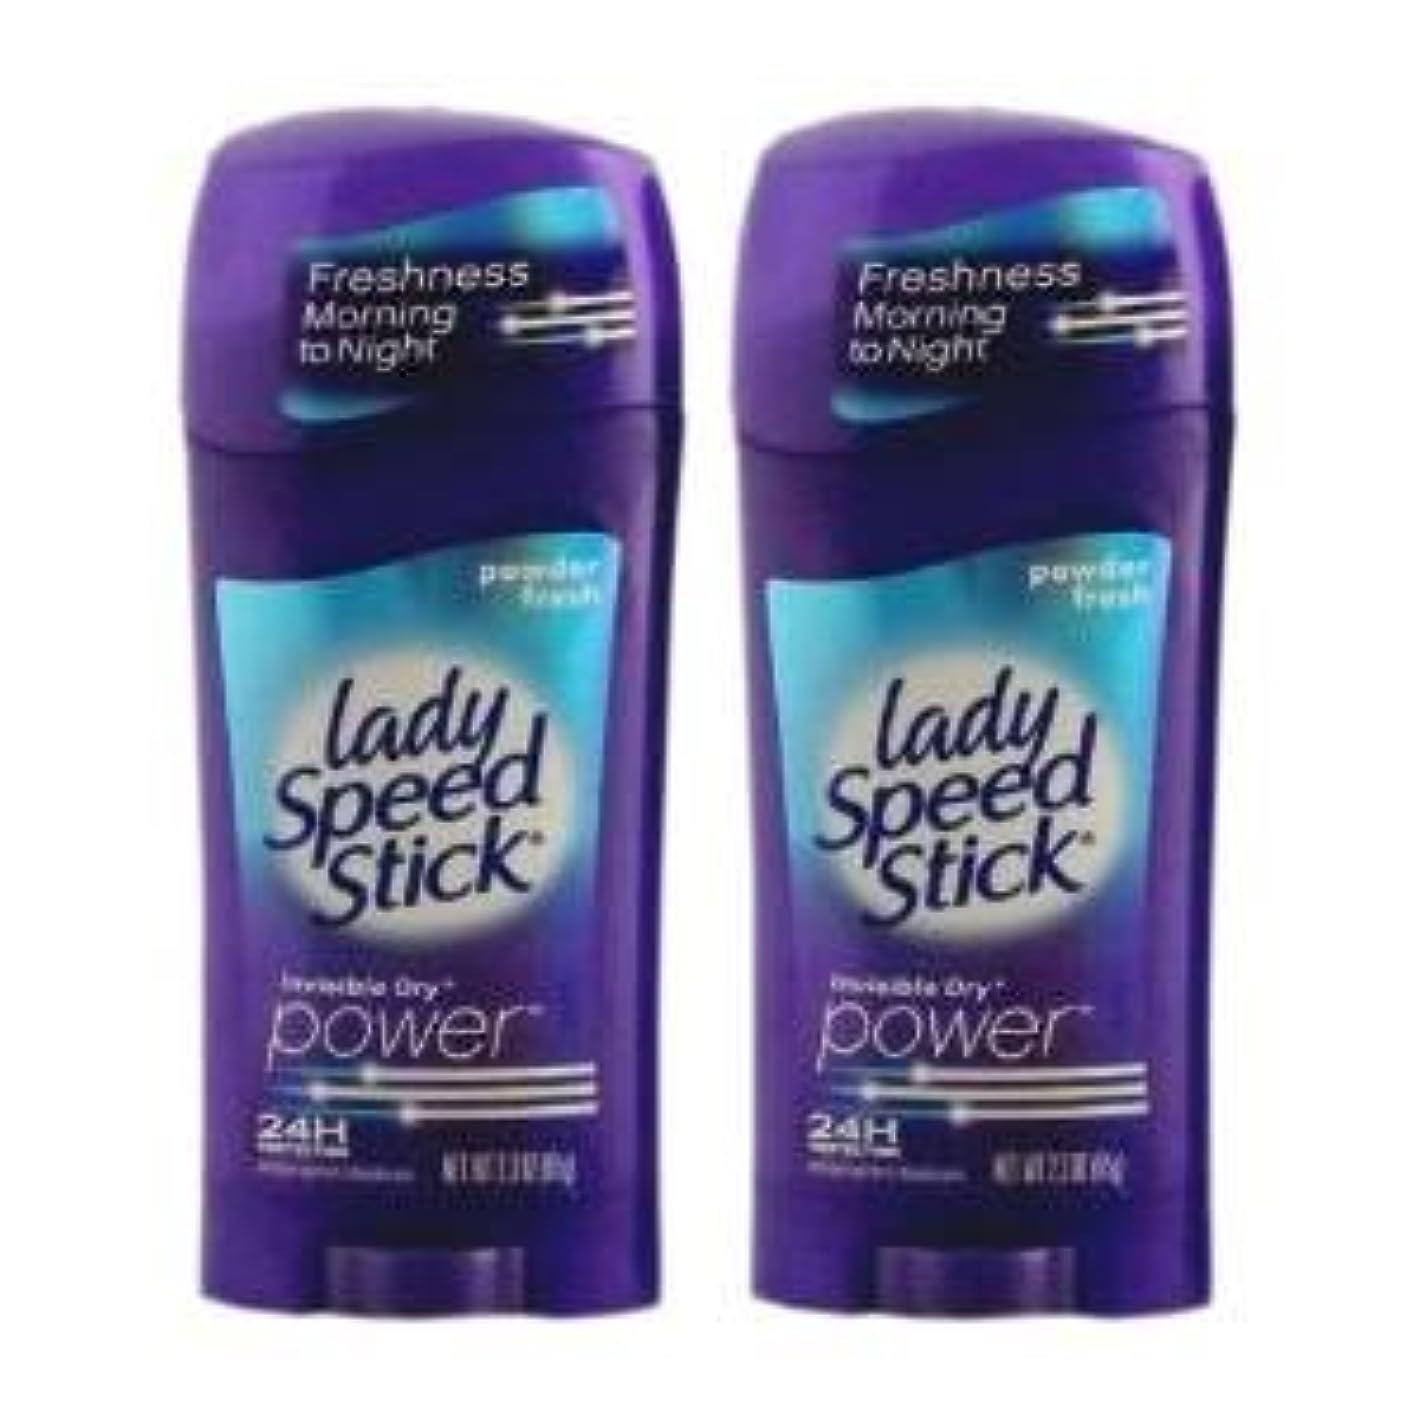 Lady Speed Stick パワー デオドラント(Powder Fresh) 2個 [並行輸入品]